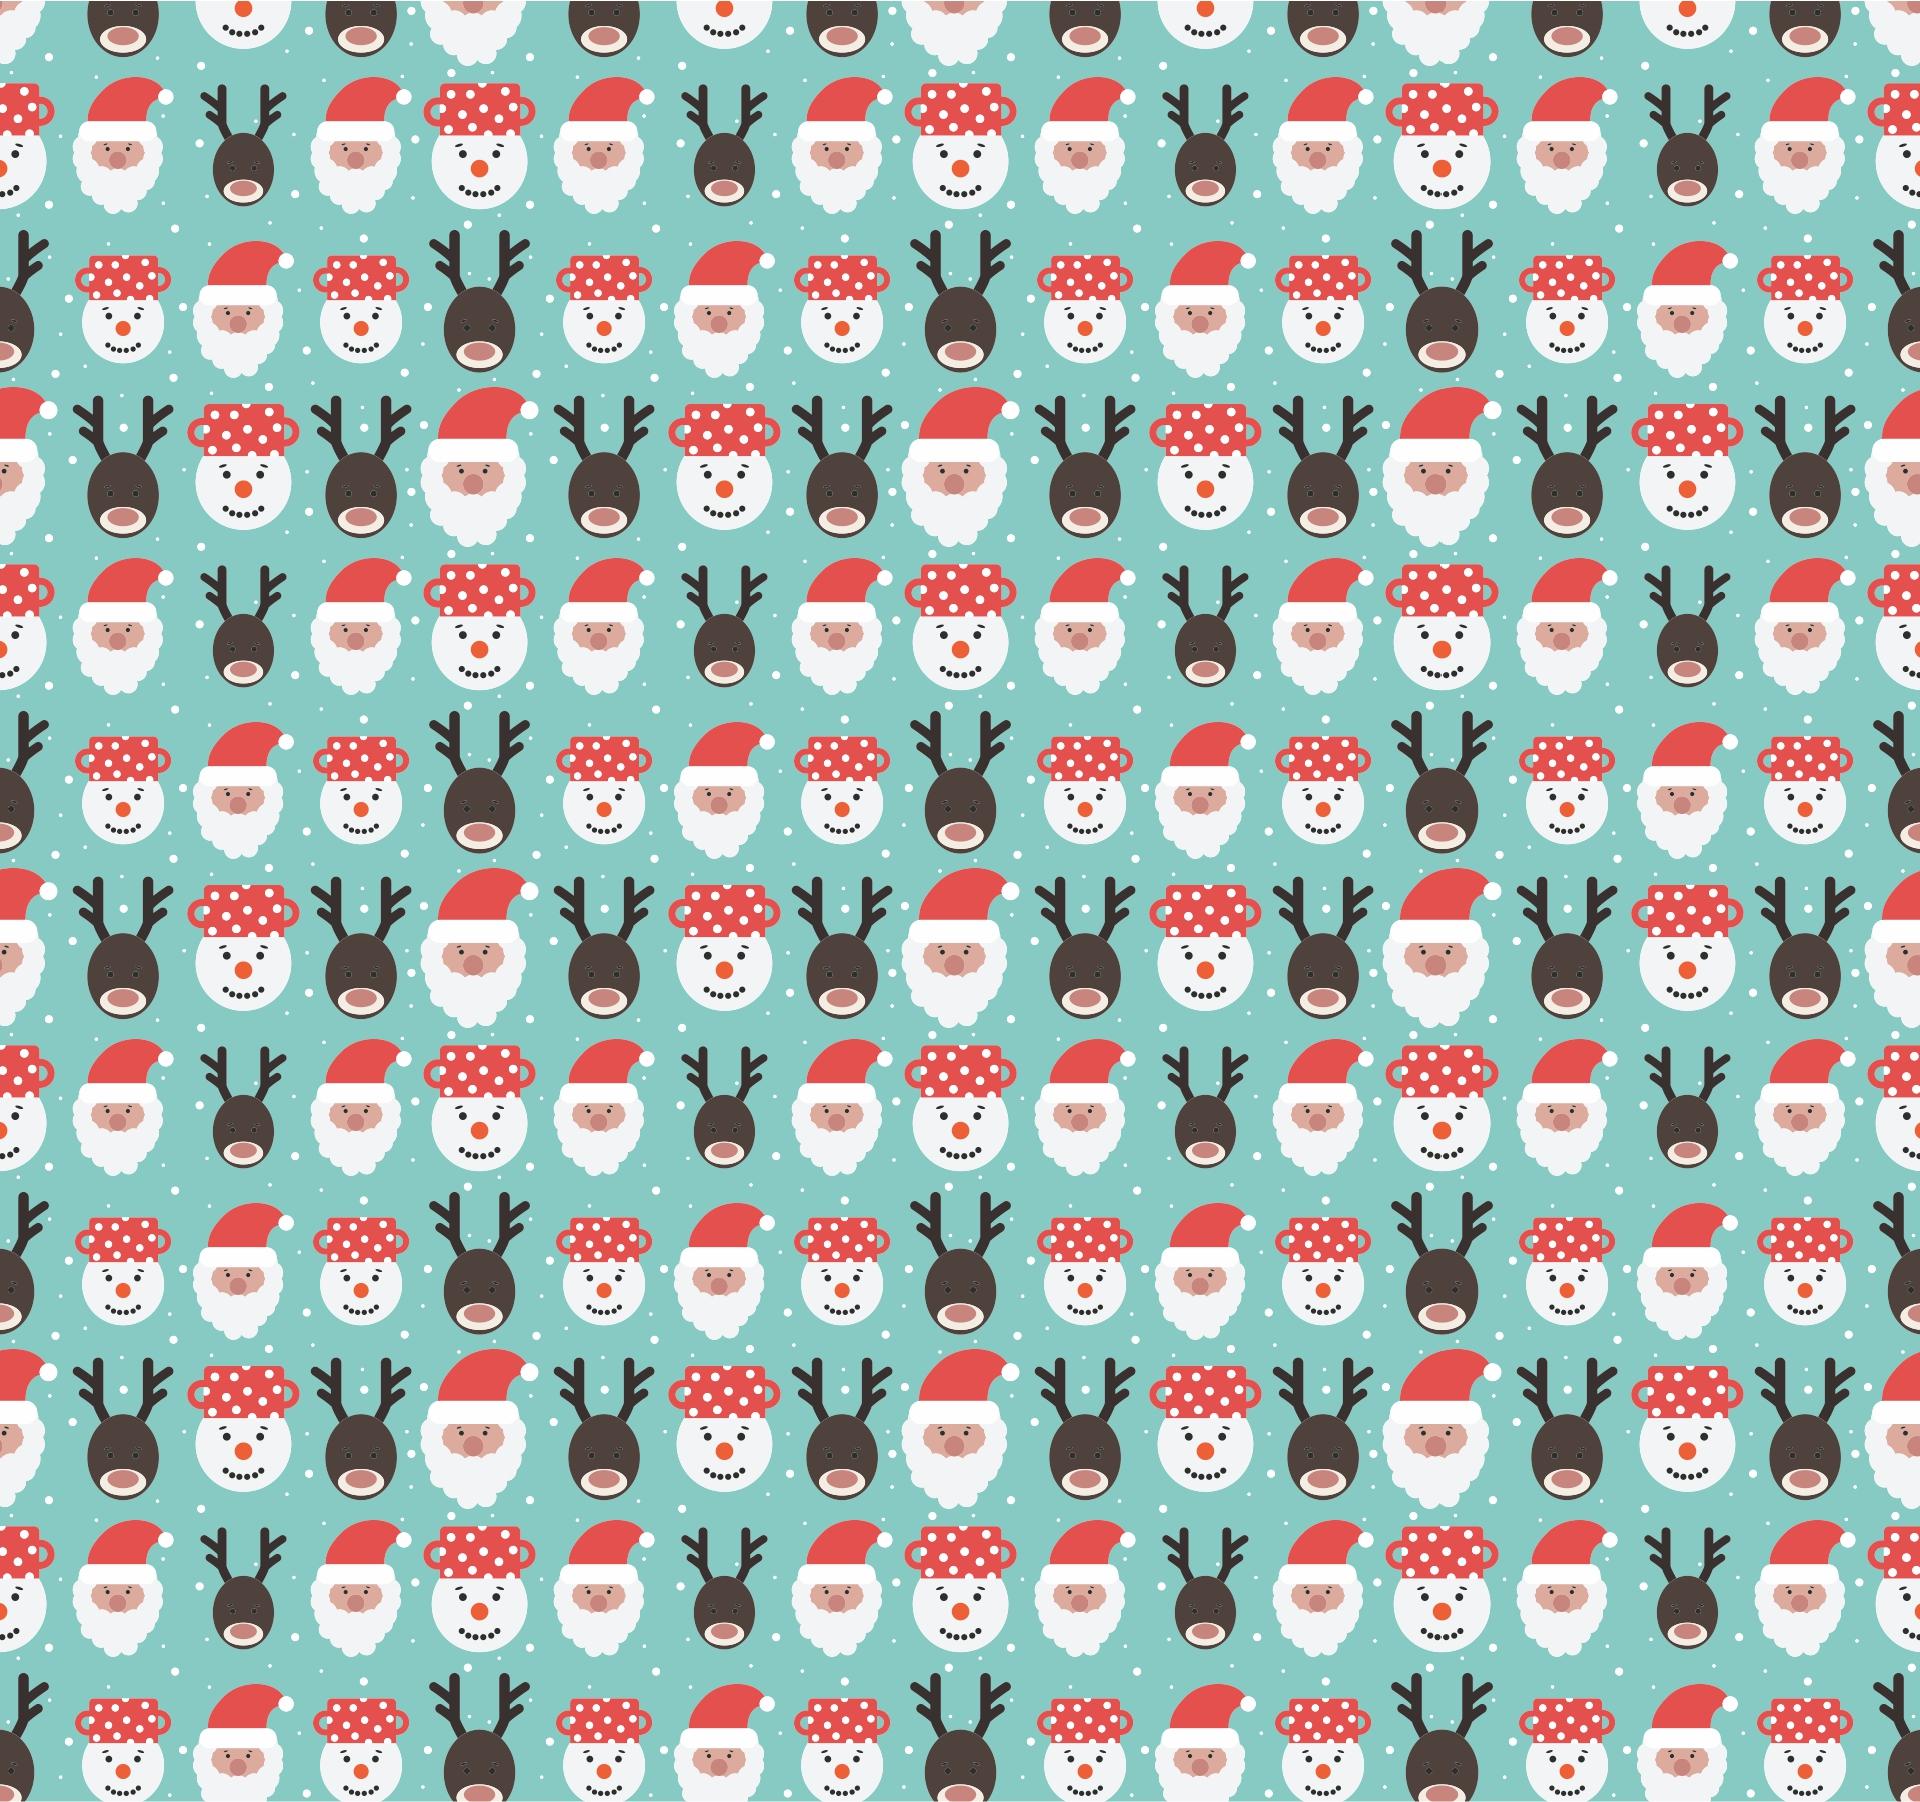 9 Best Images of Reindeer Free Printable Faces - Free ...